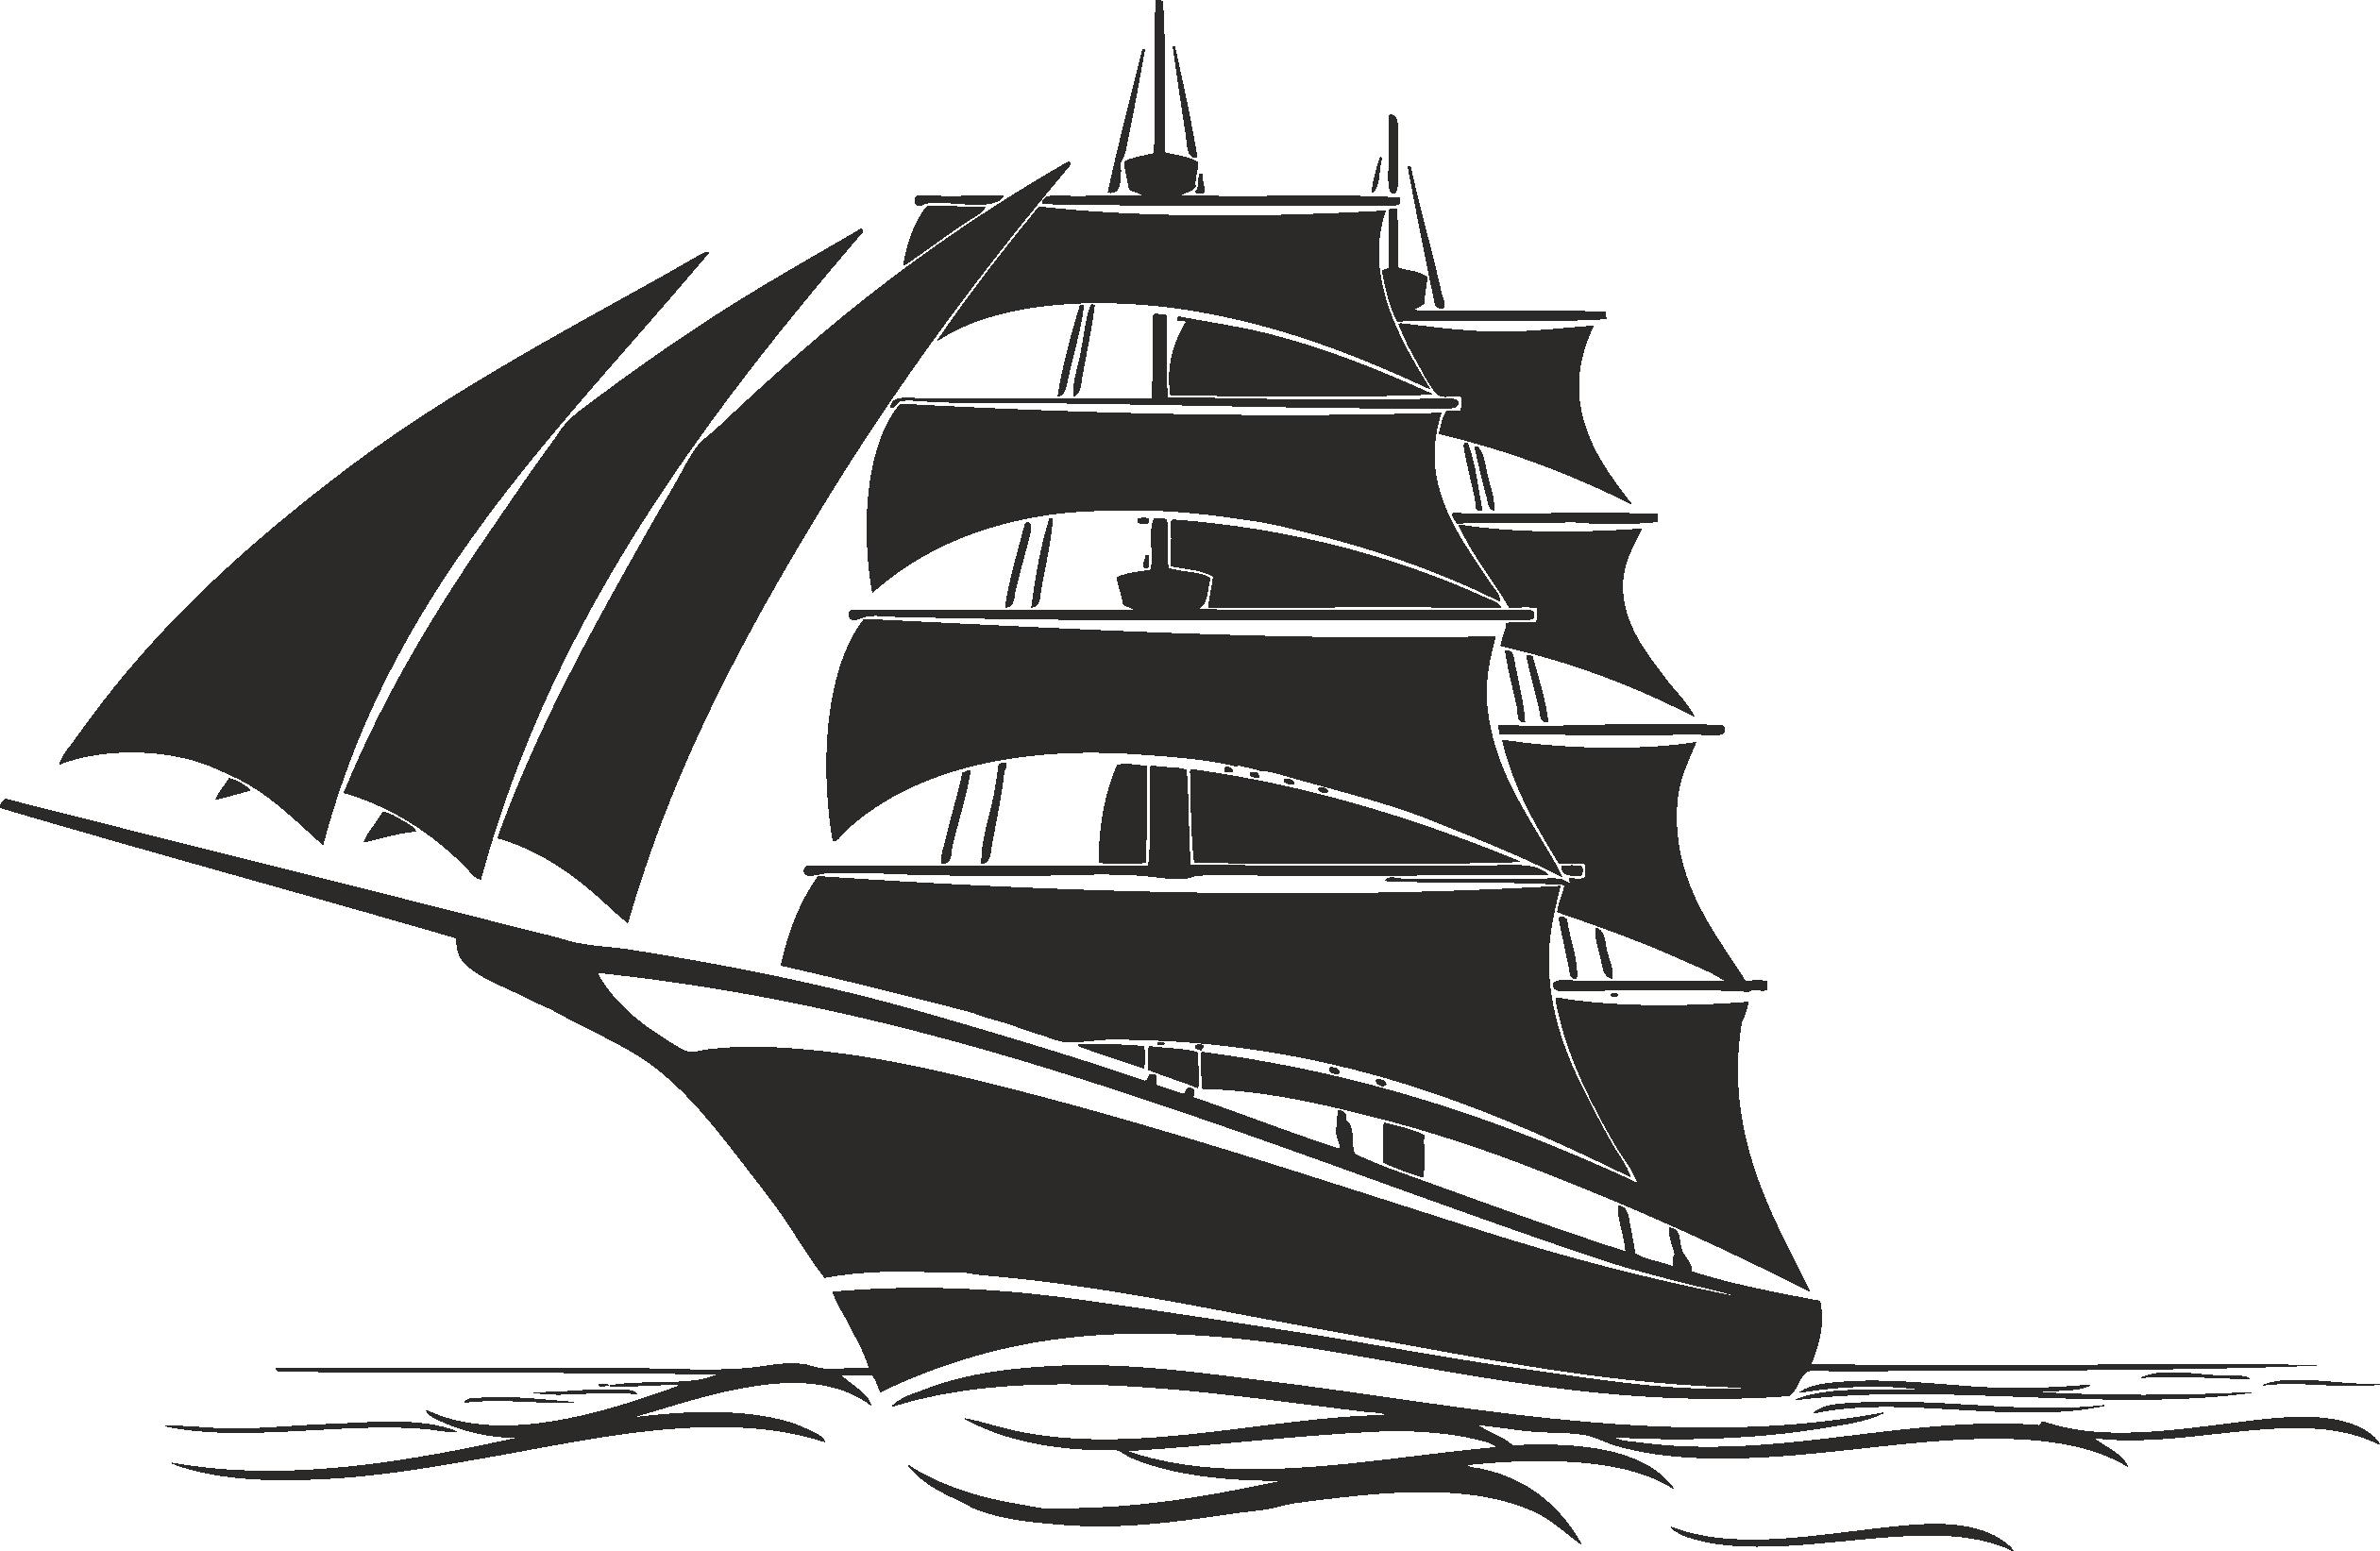 Sailboat Beautiful Silhouettes Of Sailing Ships 04 Free DXF File